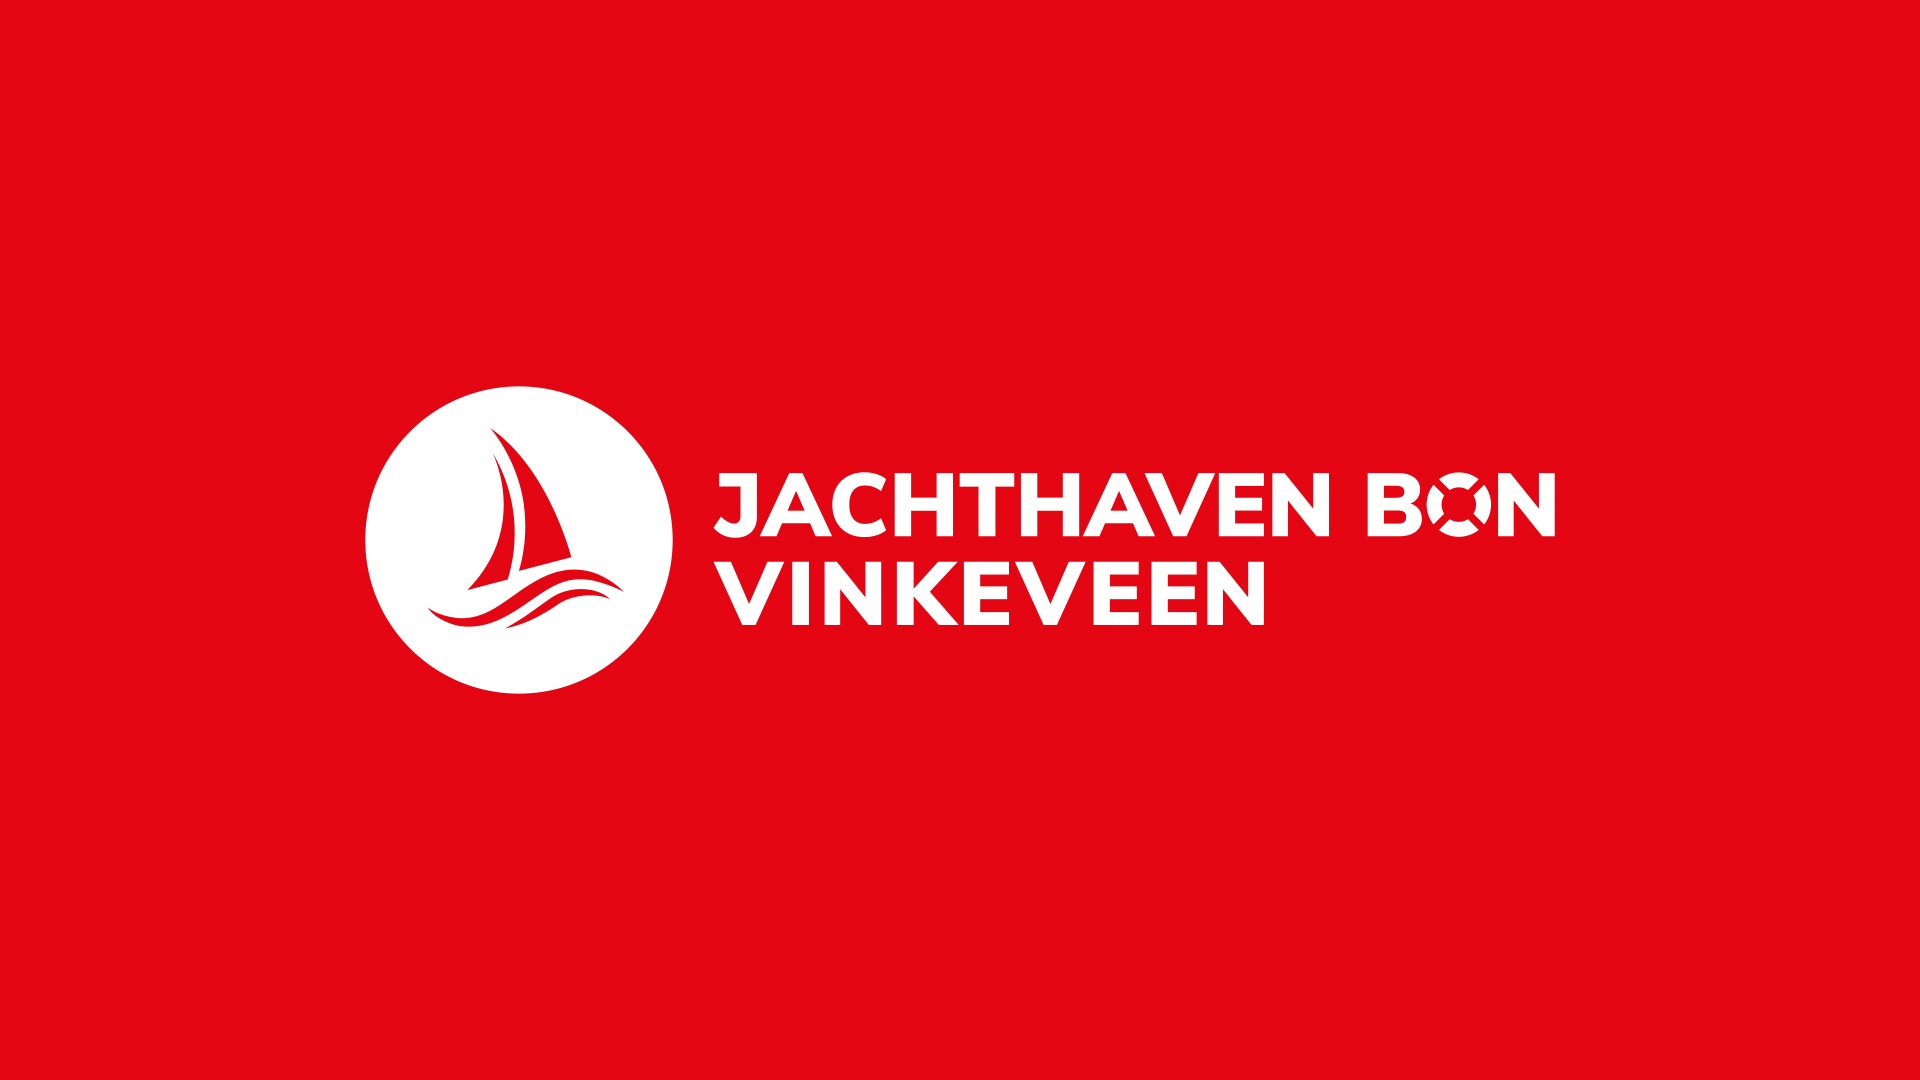 jachthaven bon vinkeveen